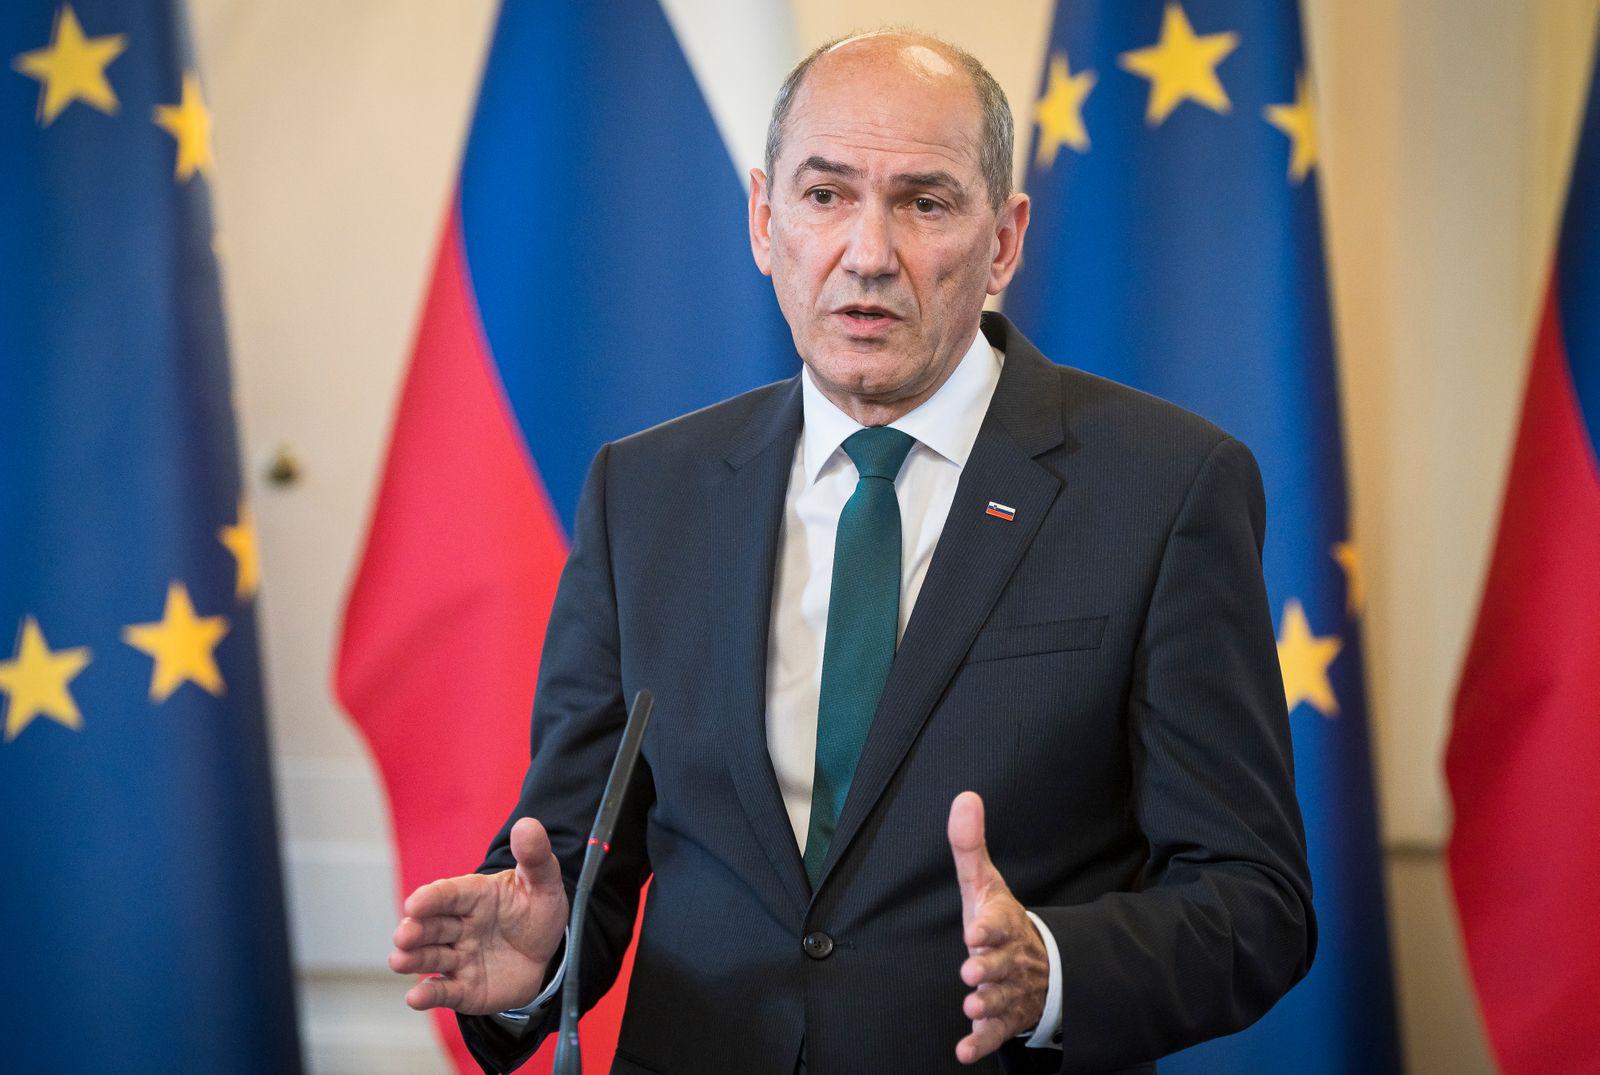 SLOVENIA-POLITICS-GOVERNMENT